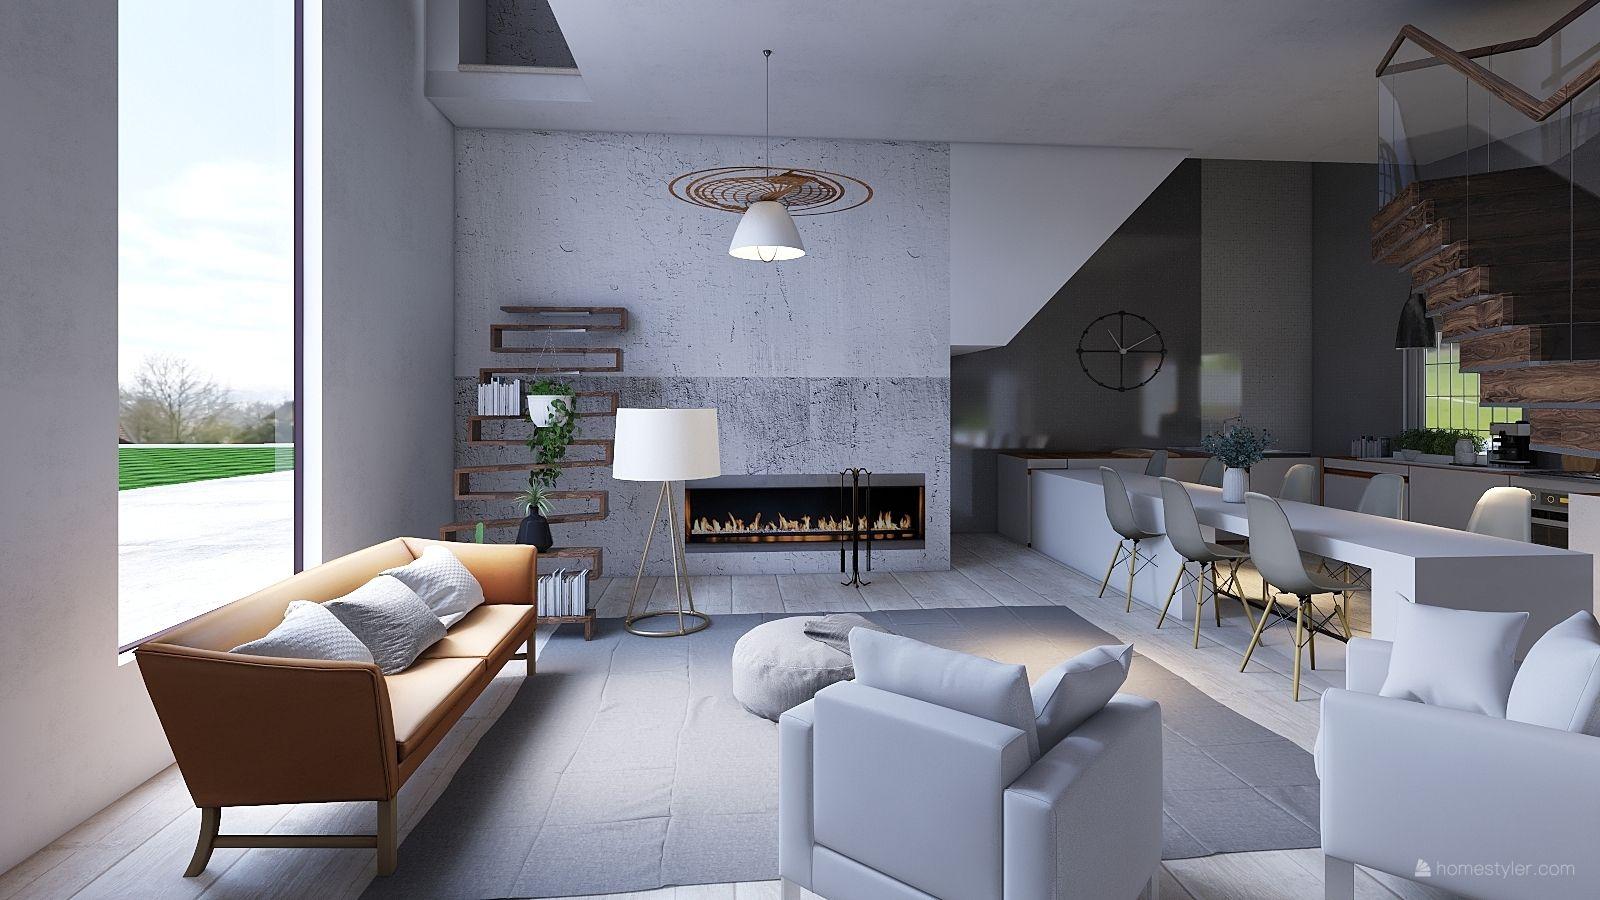 Living Room Design By Mad Designs Home Design Software 3d Home